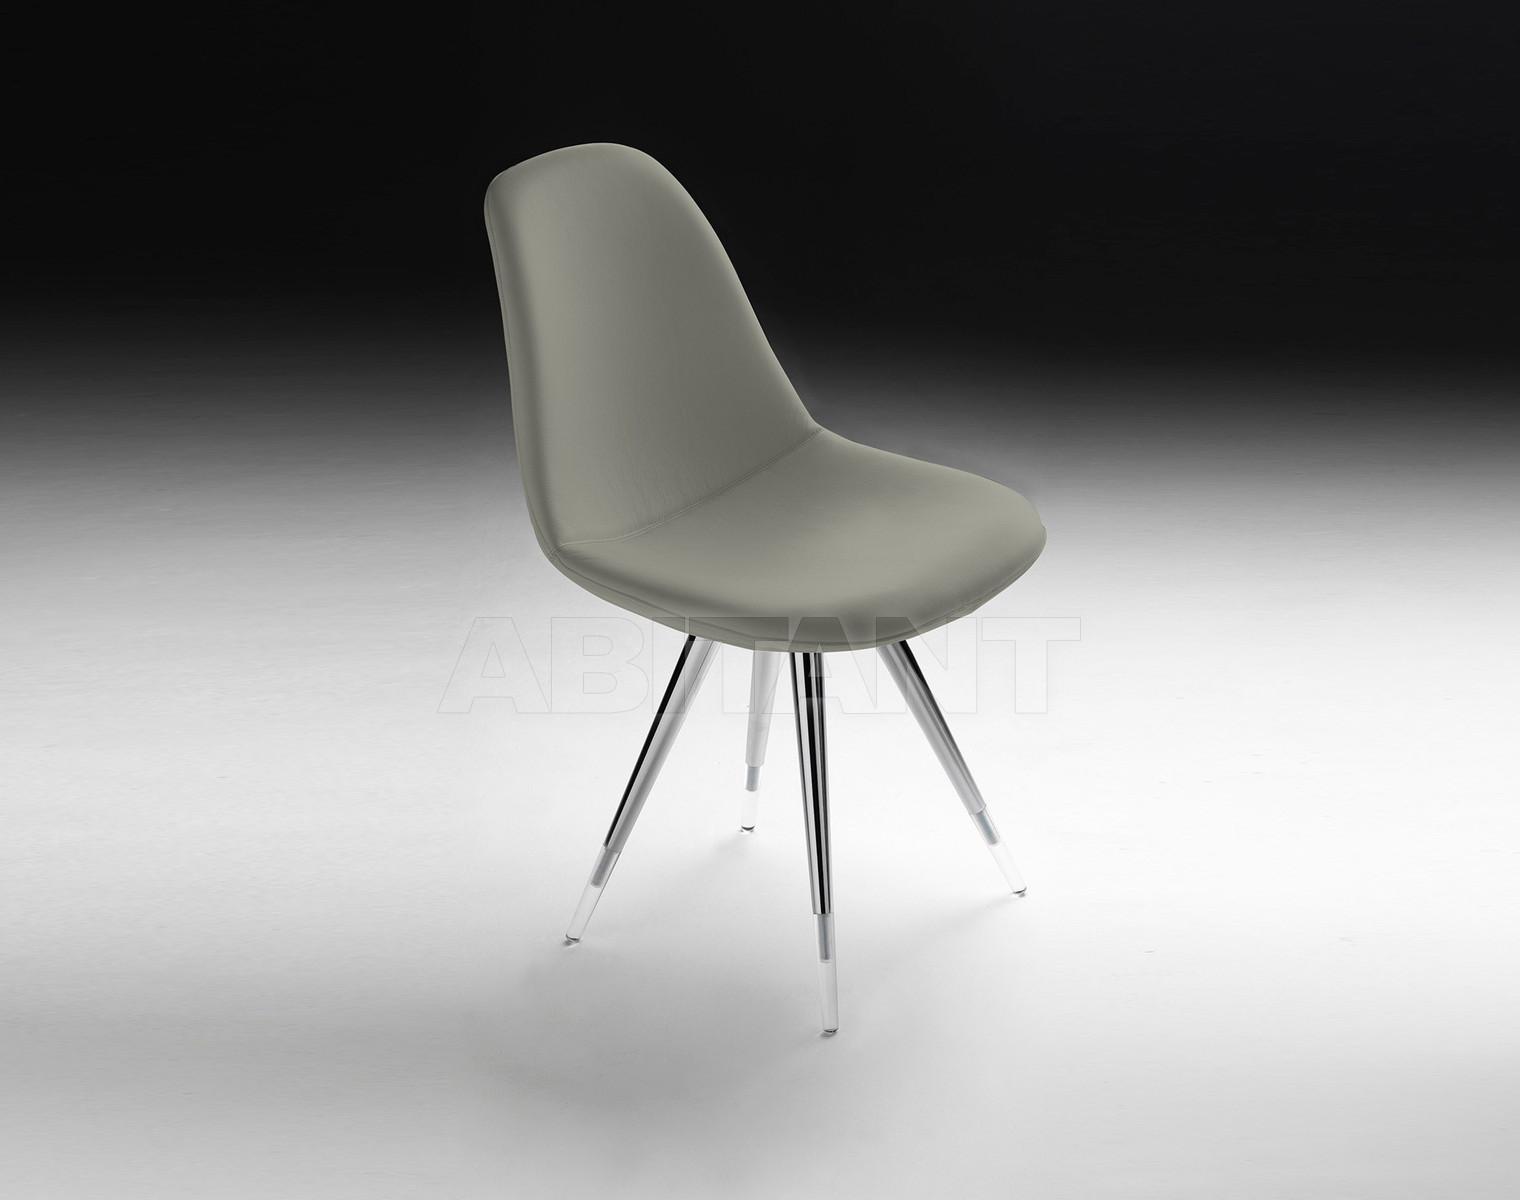 Купить Стул Kubikoff Gino Lemson & Ruud Bos Angel'POP'Chair' 05